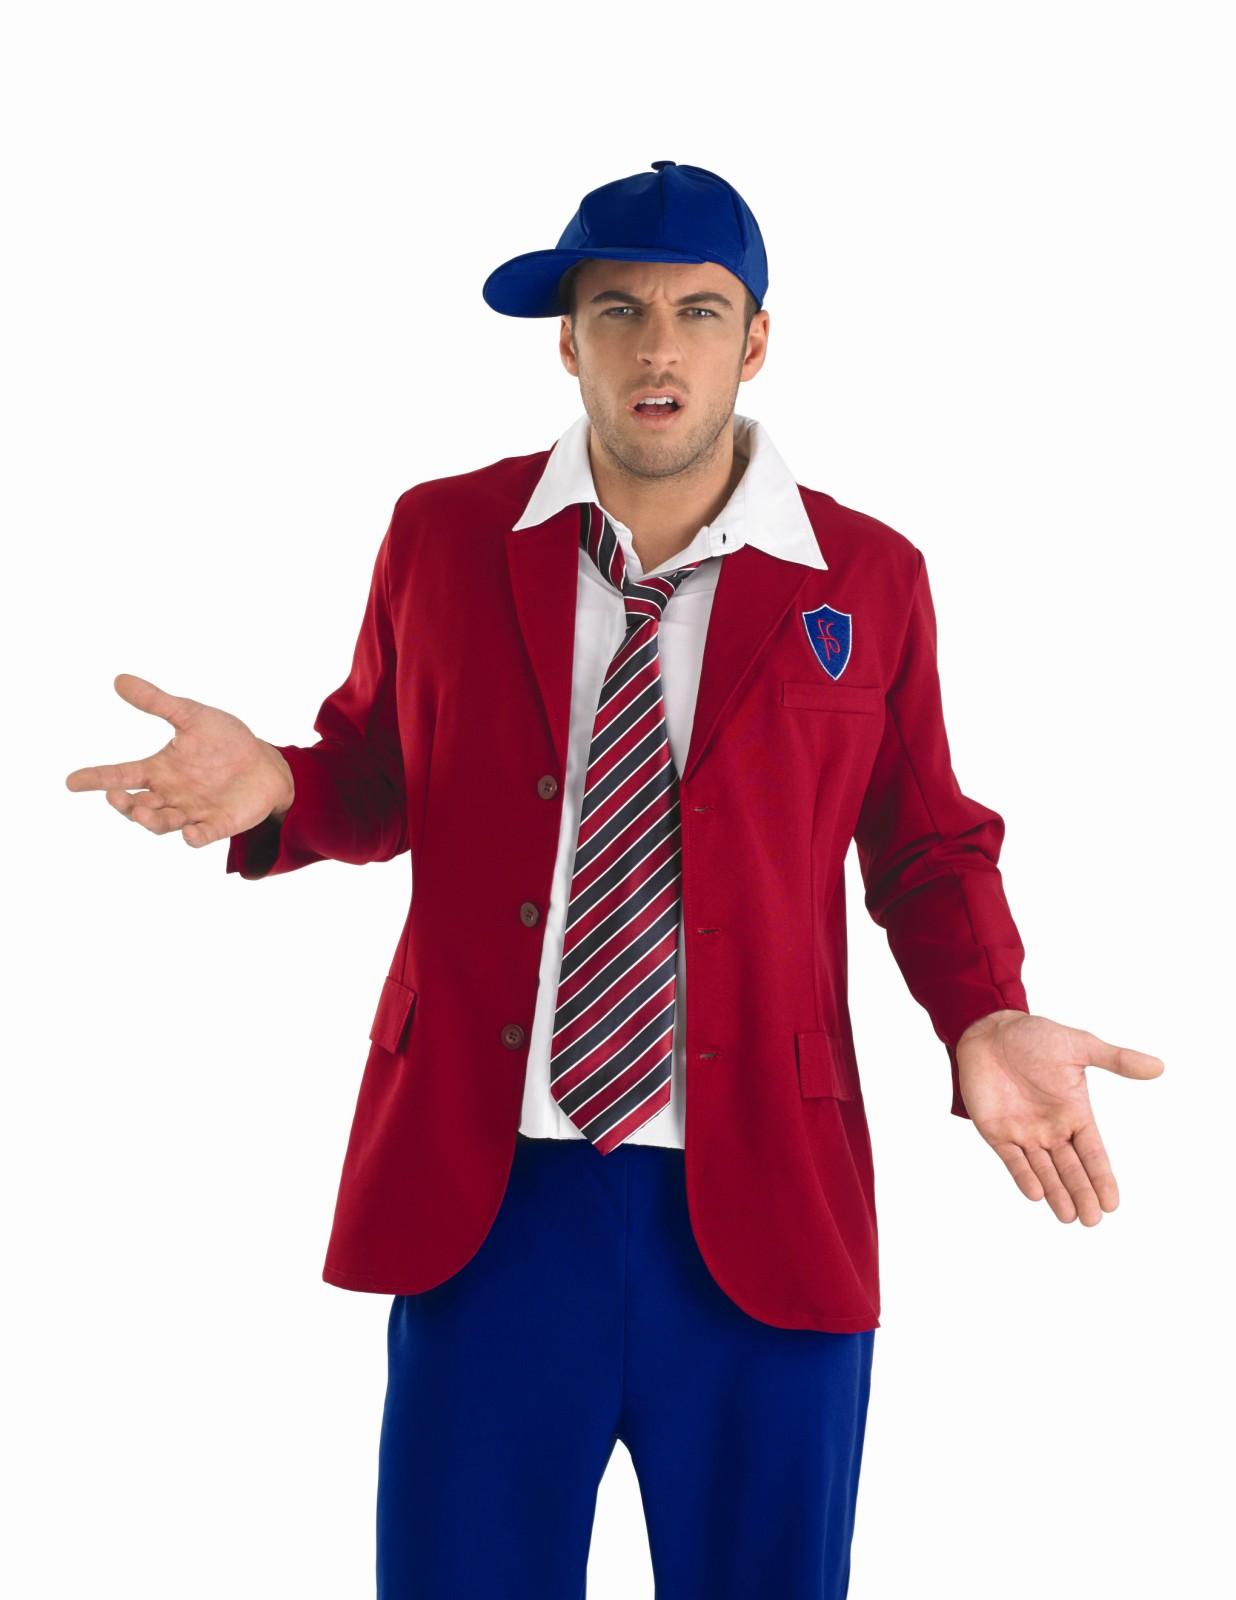 Mens School Boy Costume For Schoolboy Fancy Dress Up Outfit | EBay